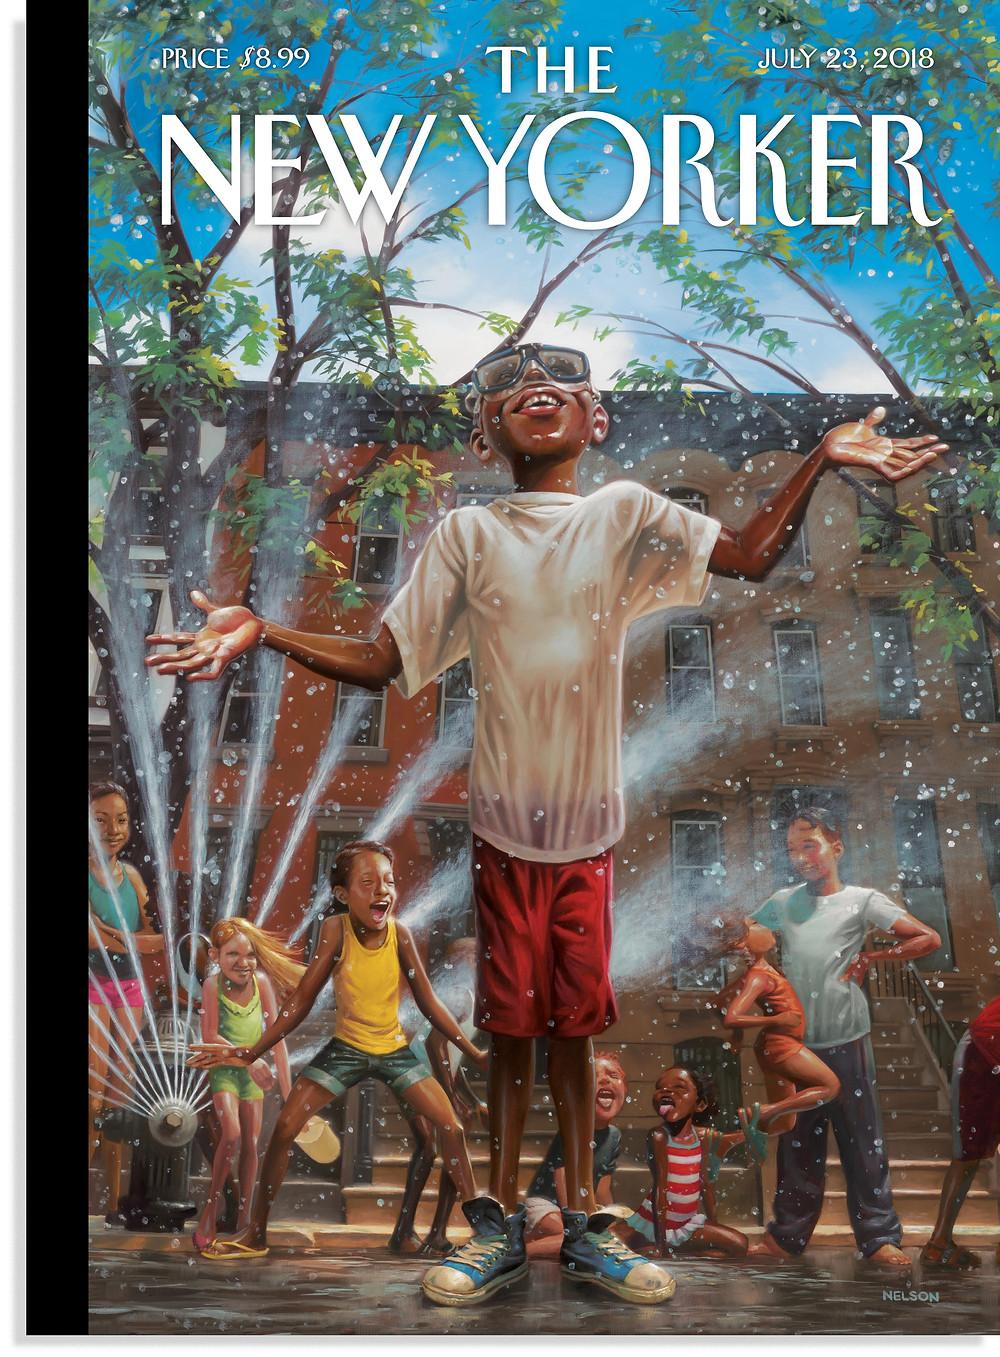 """Summertime City,"" Kadir Nelson, July 23, 2018"